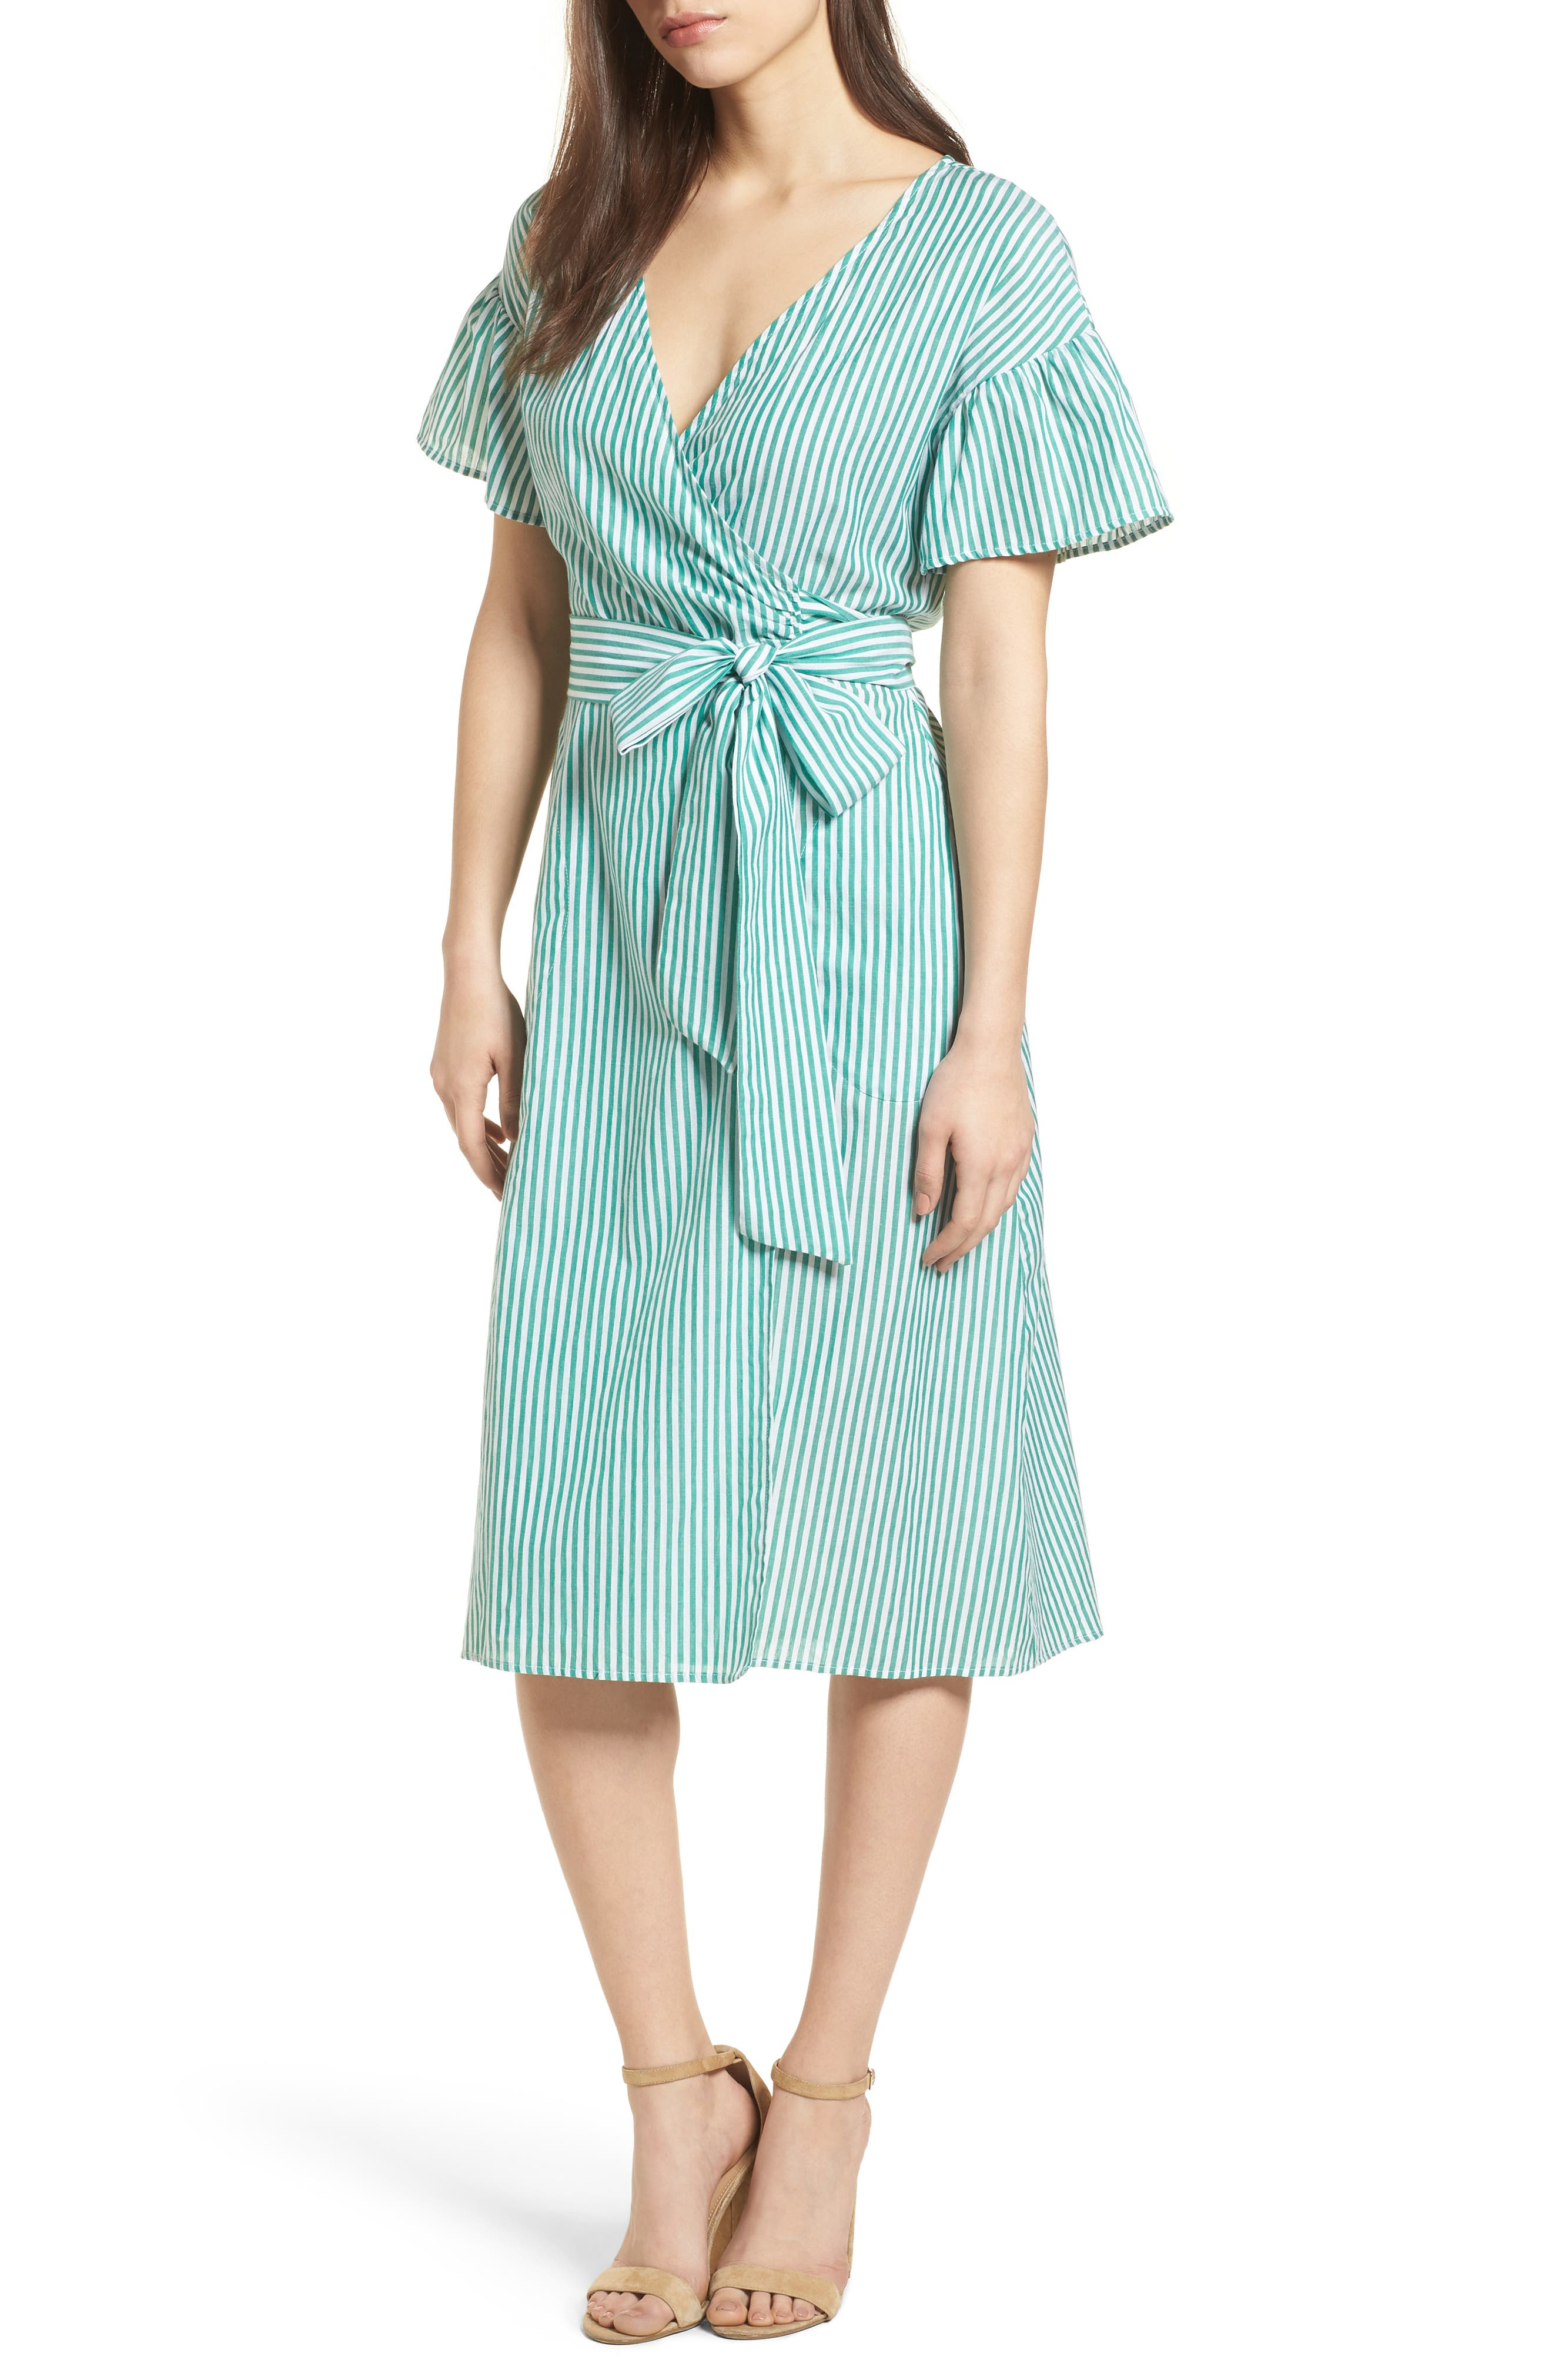 Cotton Formal Dresses